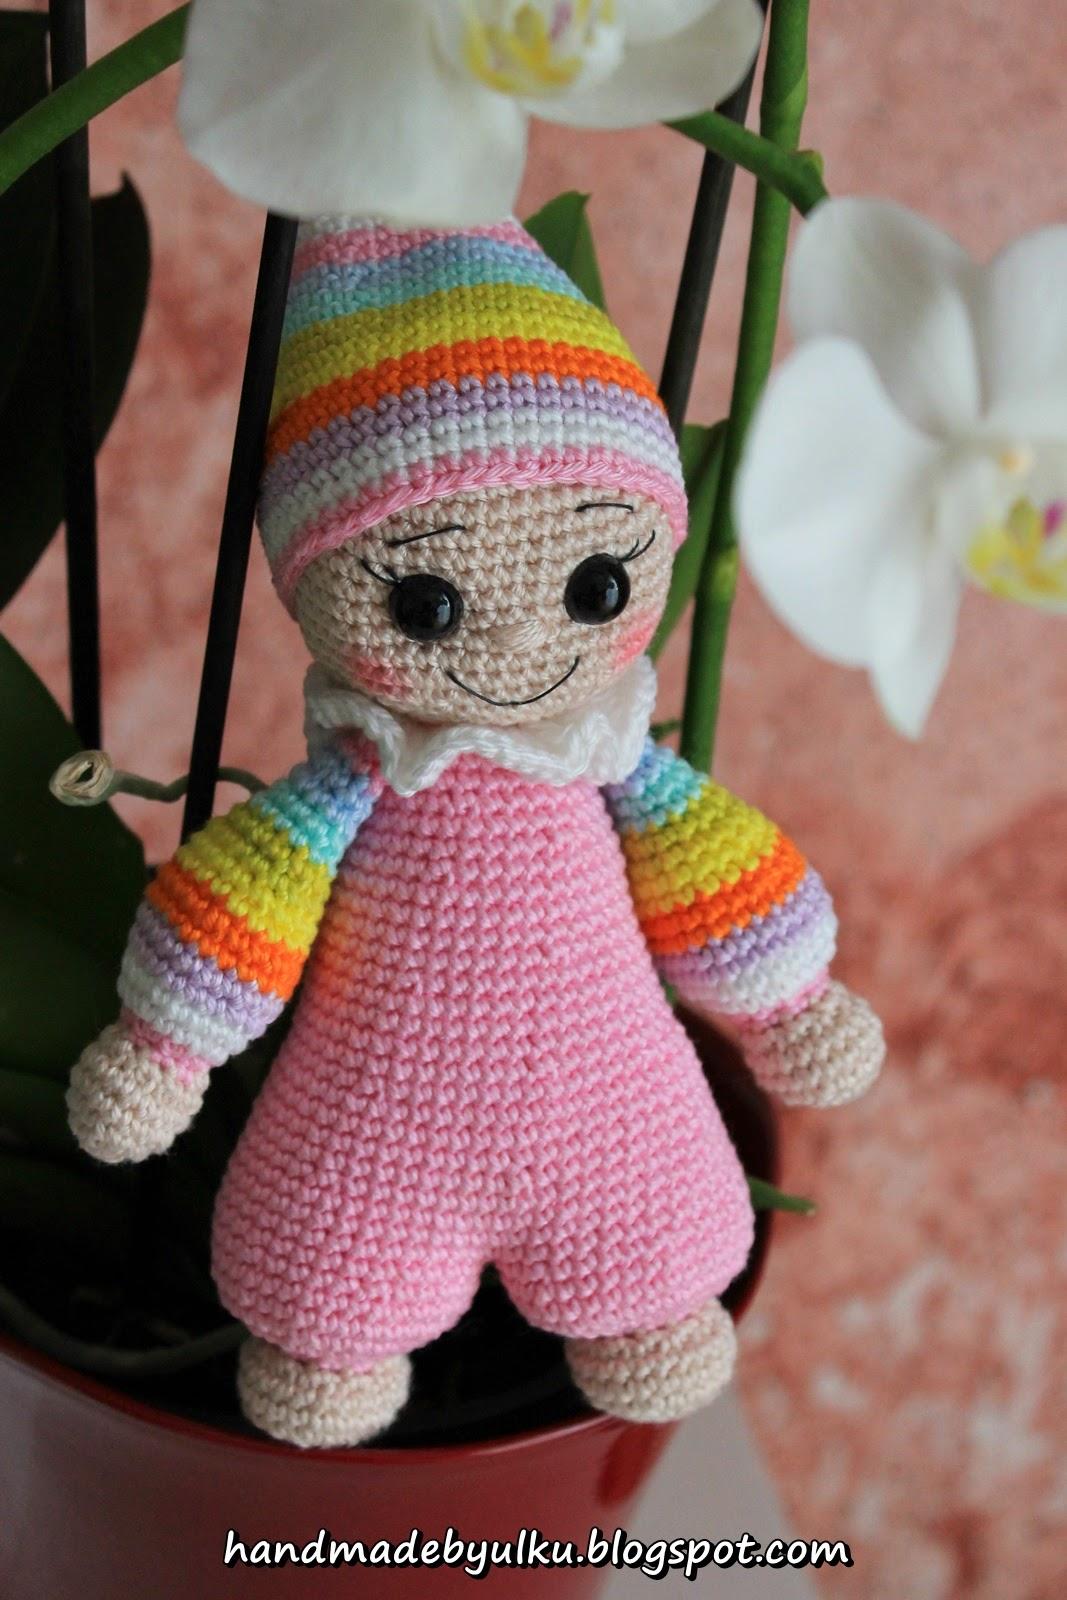 Amigurumi Cuddly Baby : Handmade by ulku: Amigurumi Bunter Zwerg / Cuddly Baby